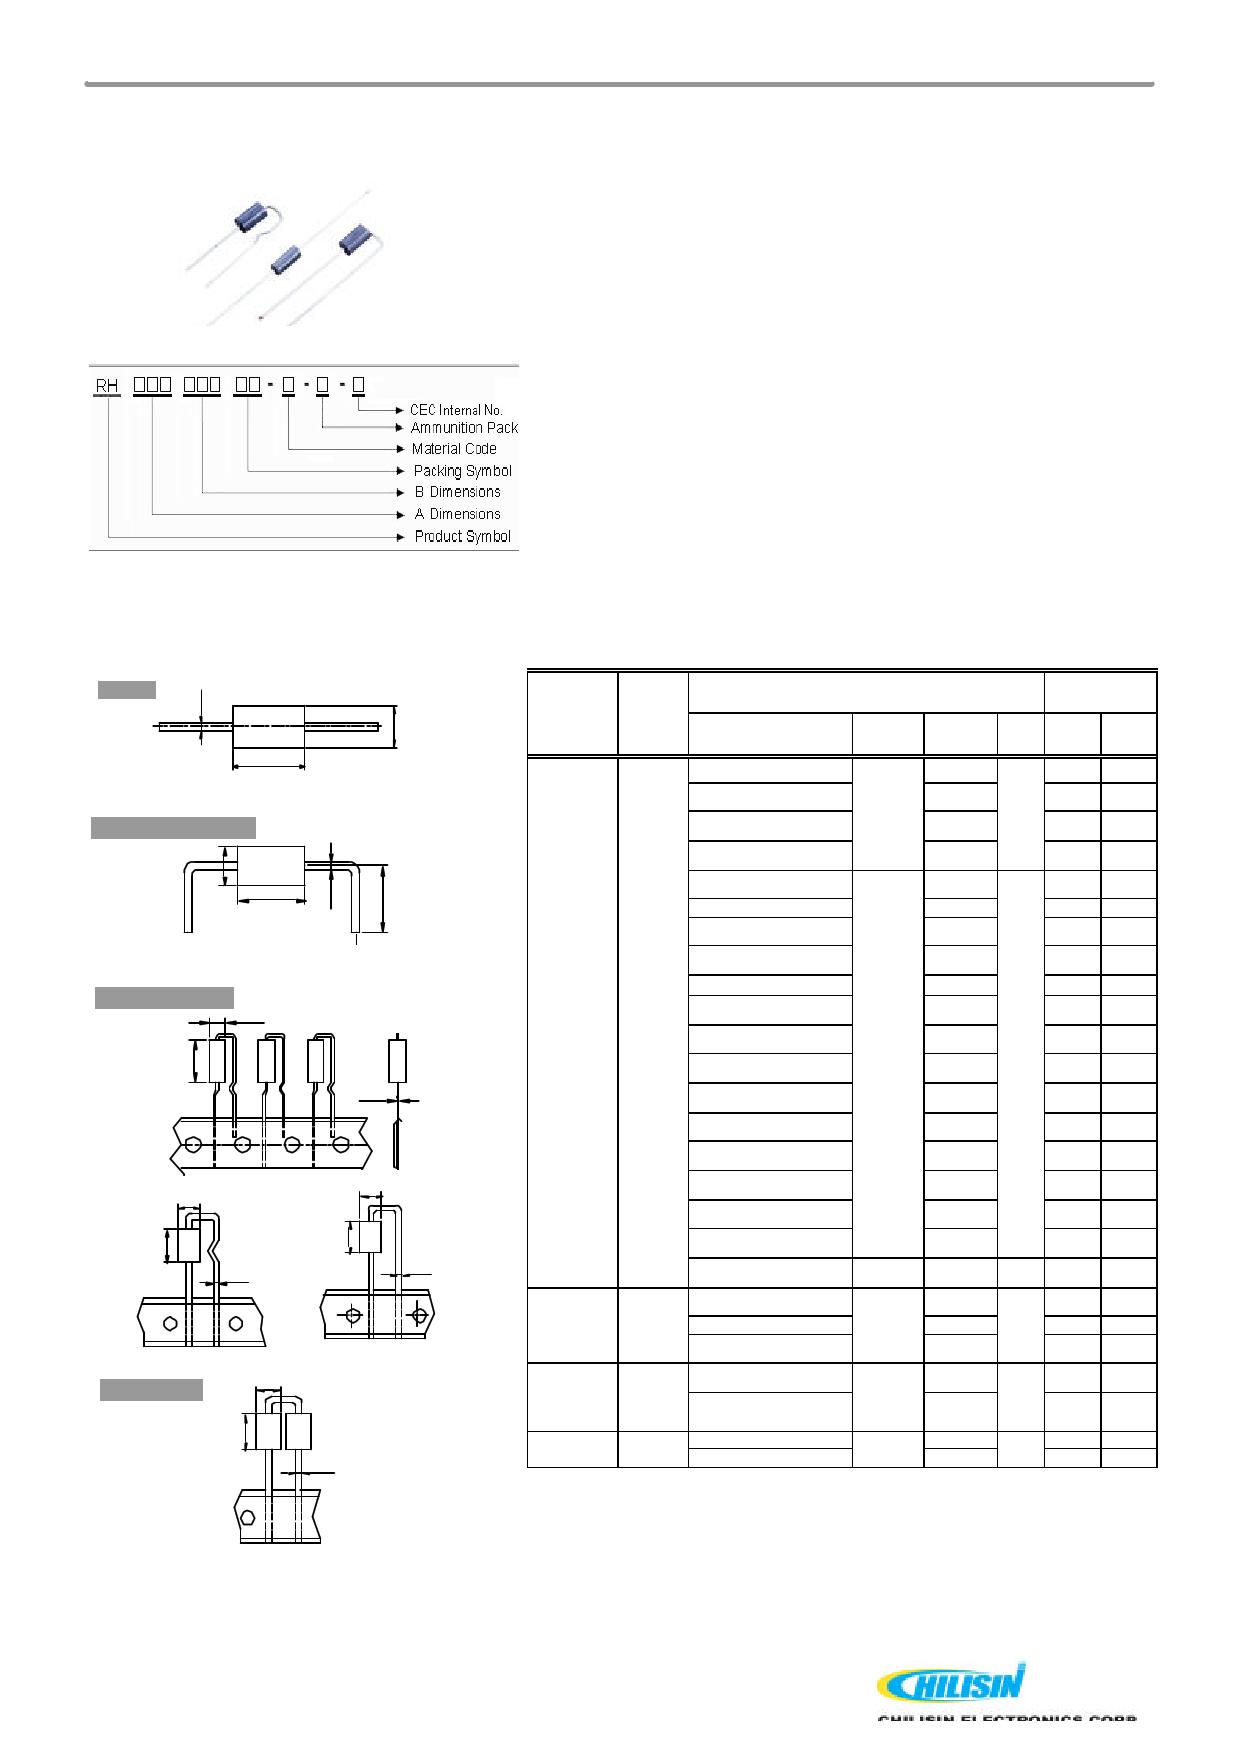 RH08010 데이터시트 및 RH08010 PDF